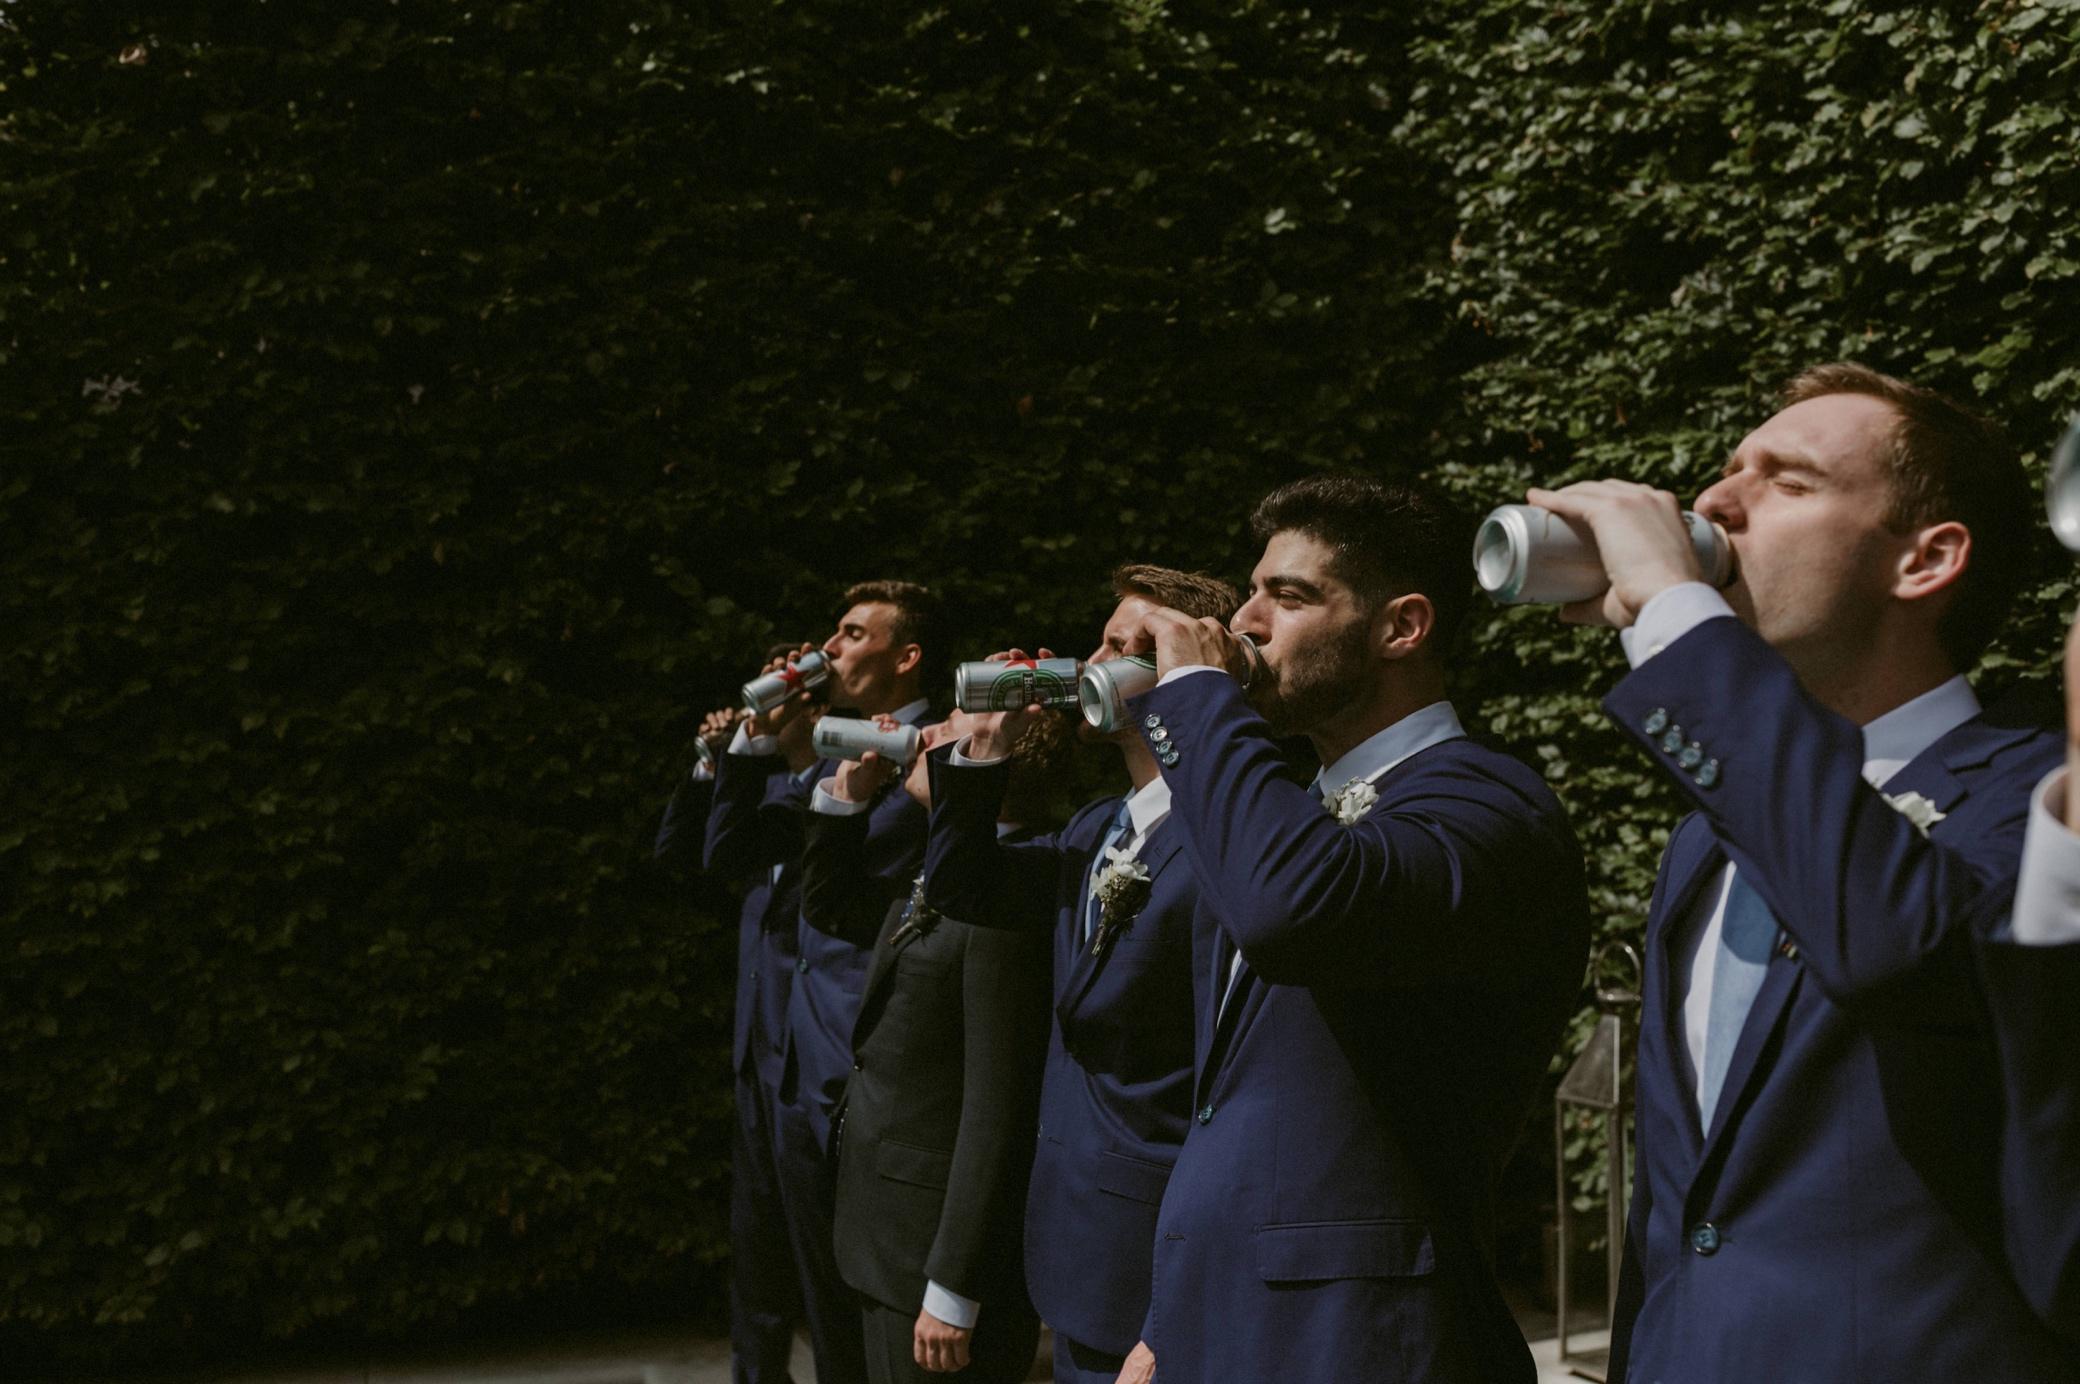 004_The Broadview Hotel Wedding (40 of 913).jpg